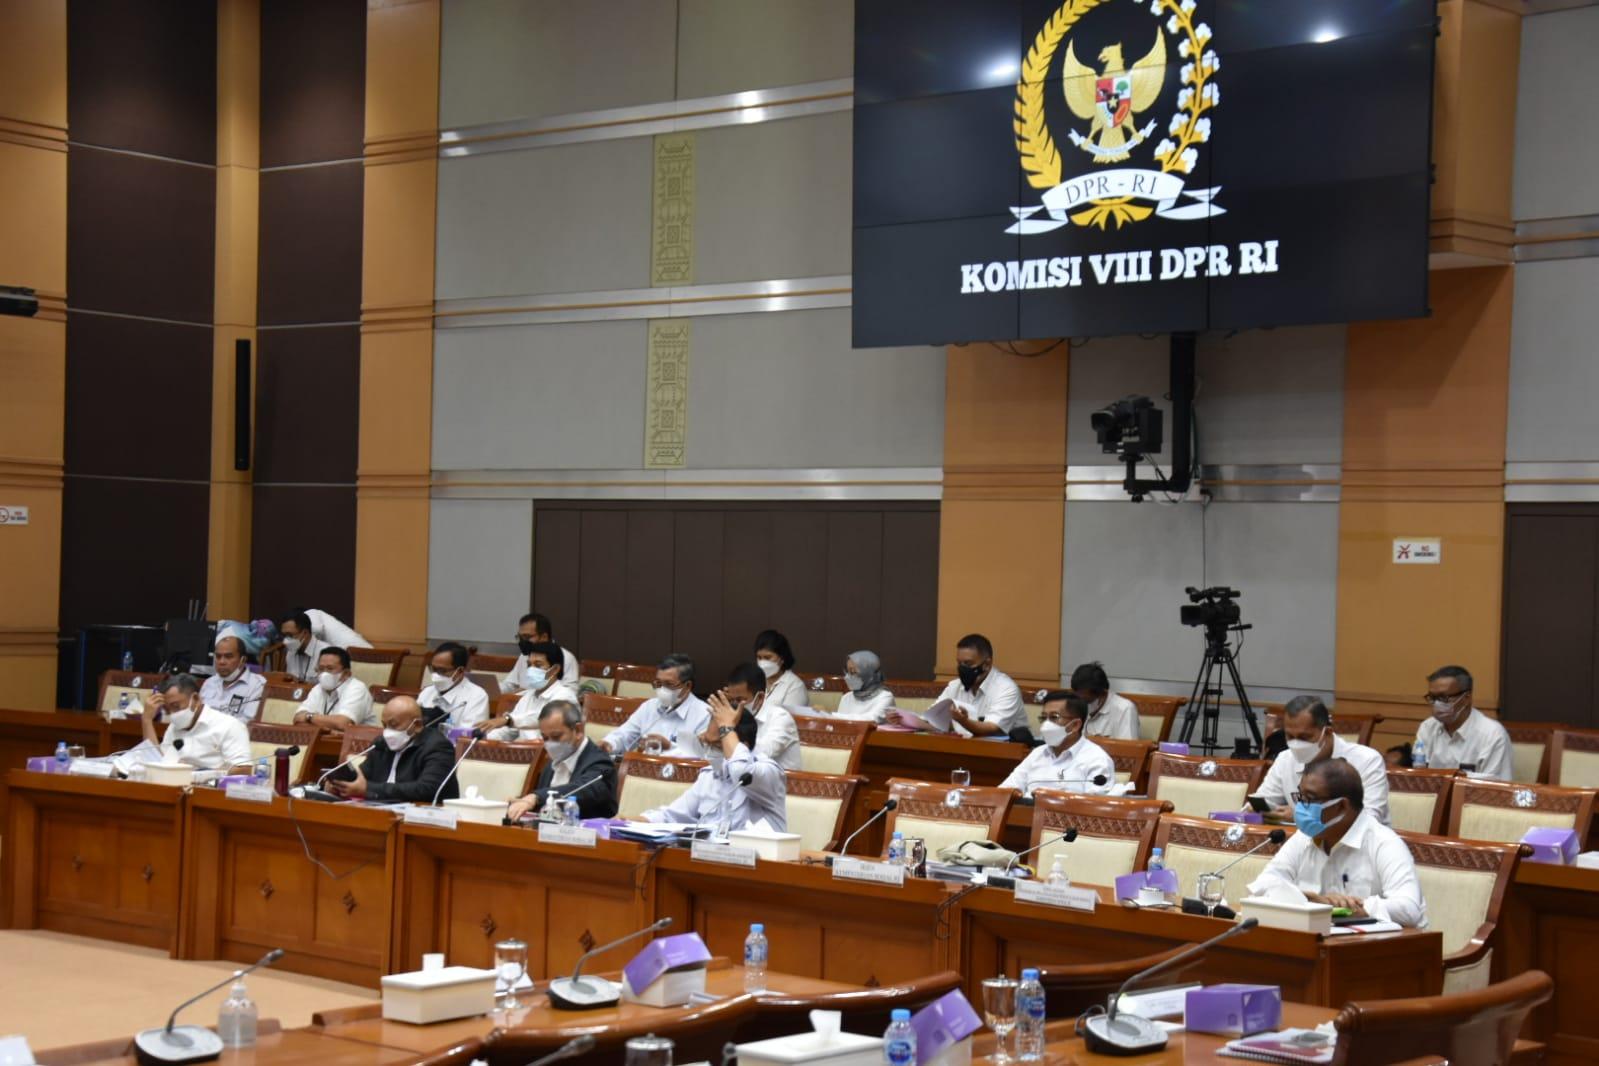 Rapat Dengar Pendapat Komisi VIII DPR dengan Kemensos